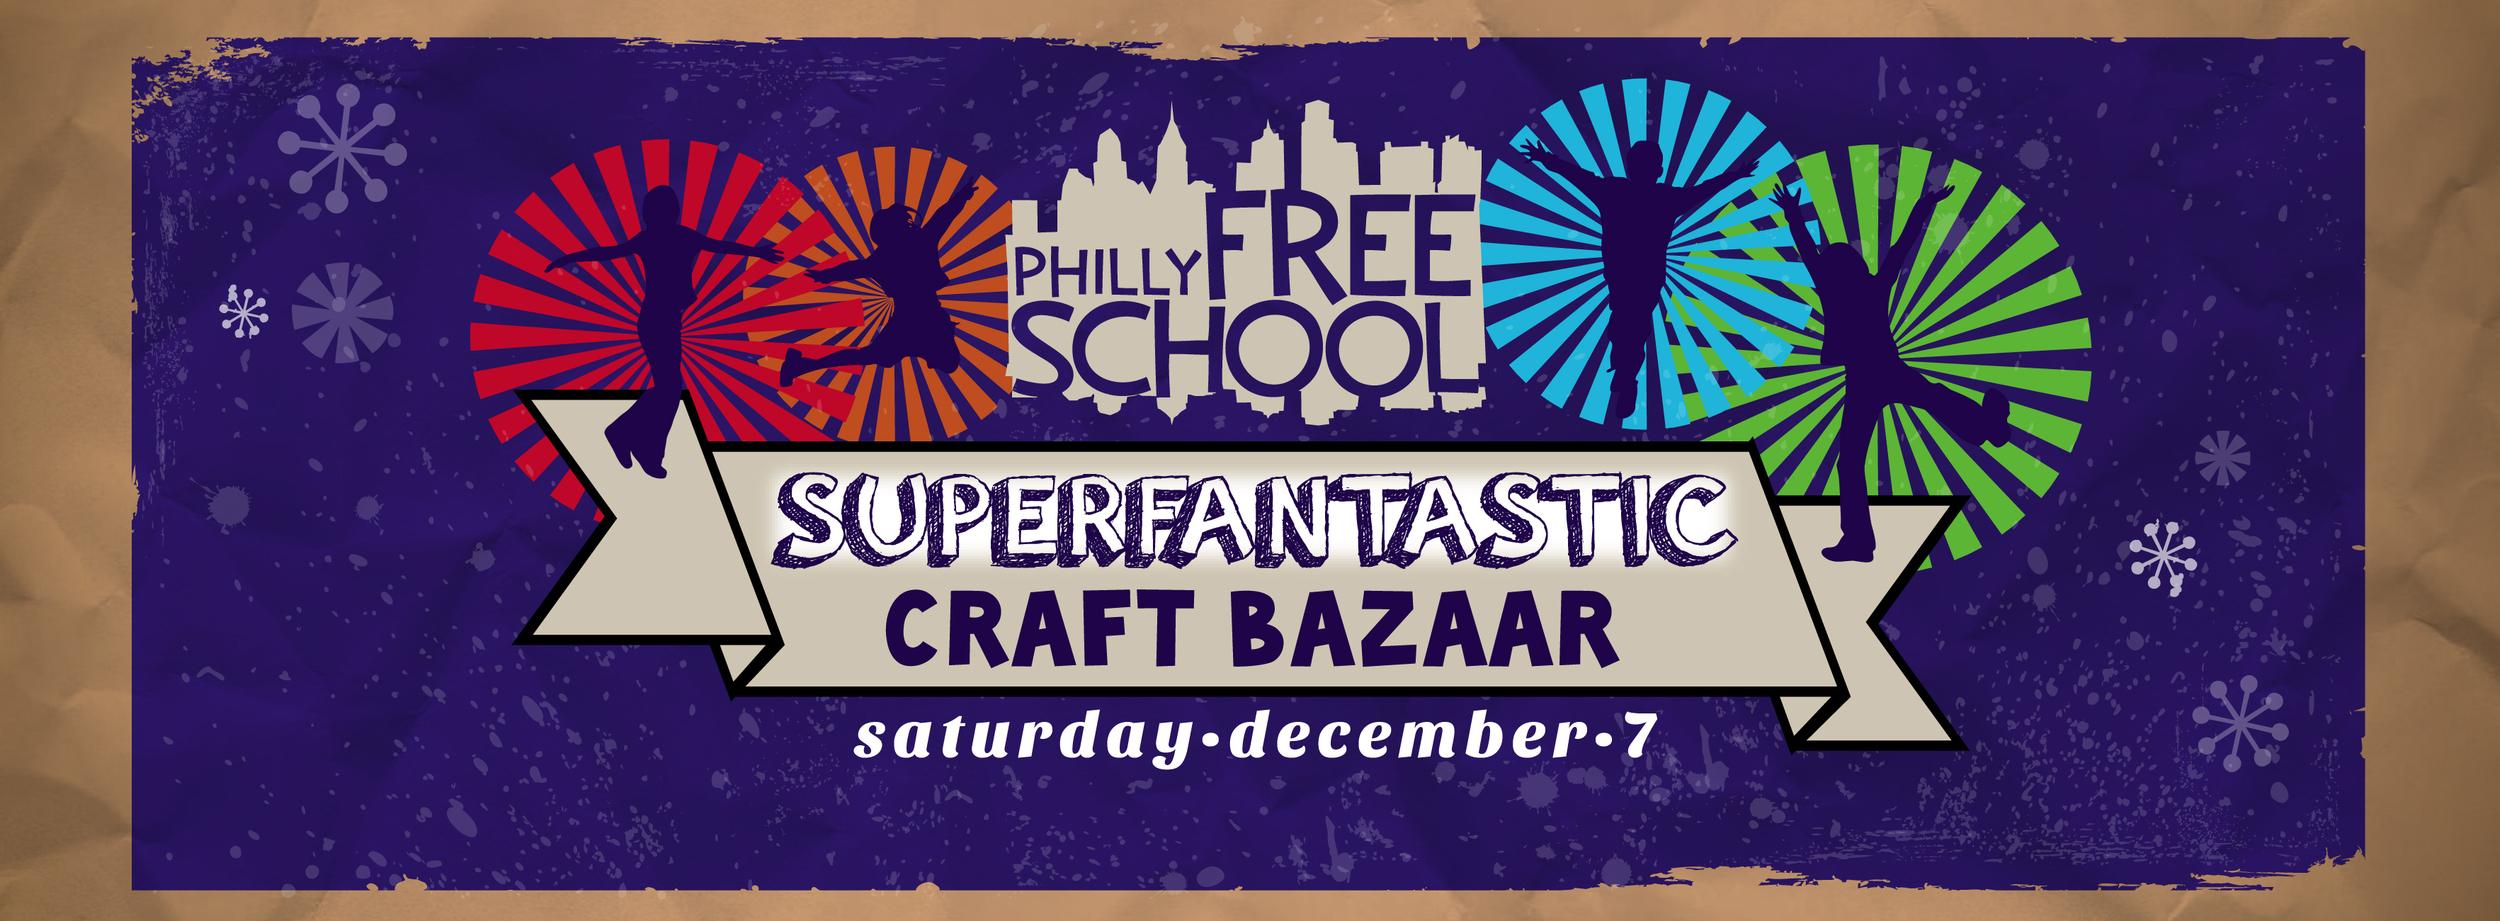 Superfantastic Craft Bazaar